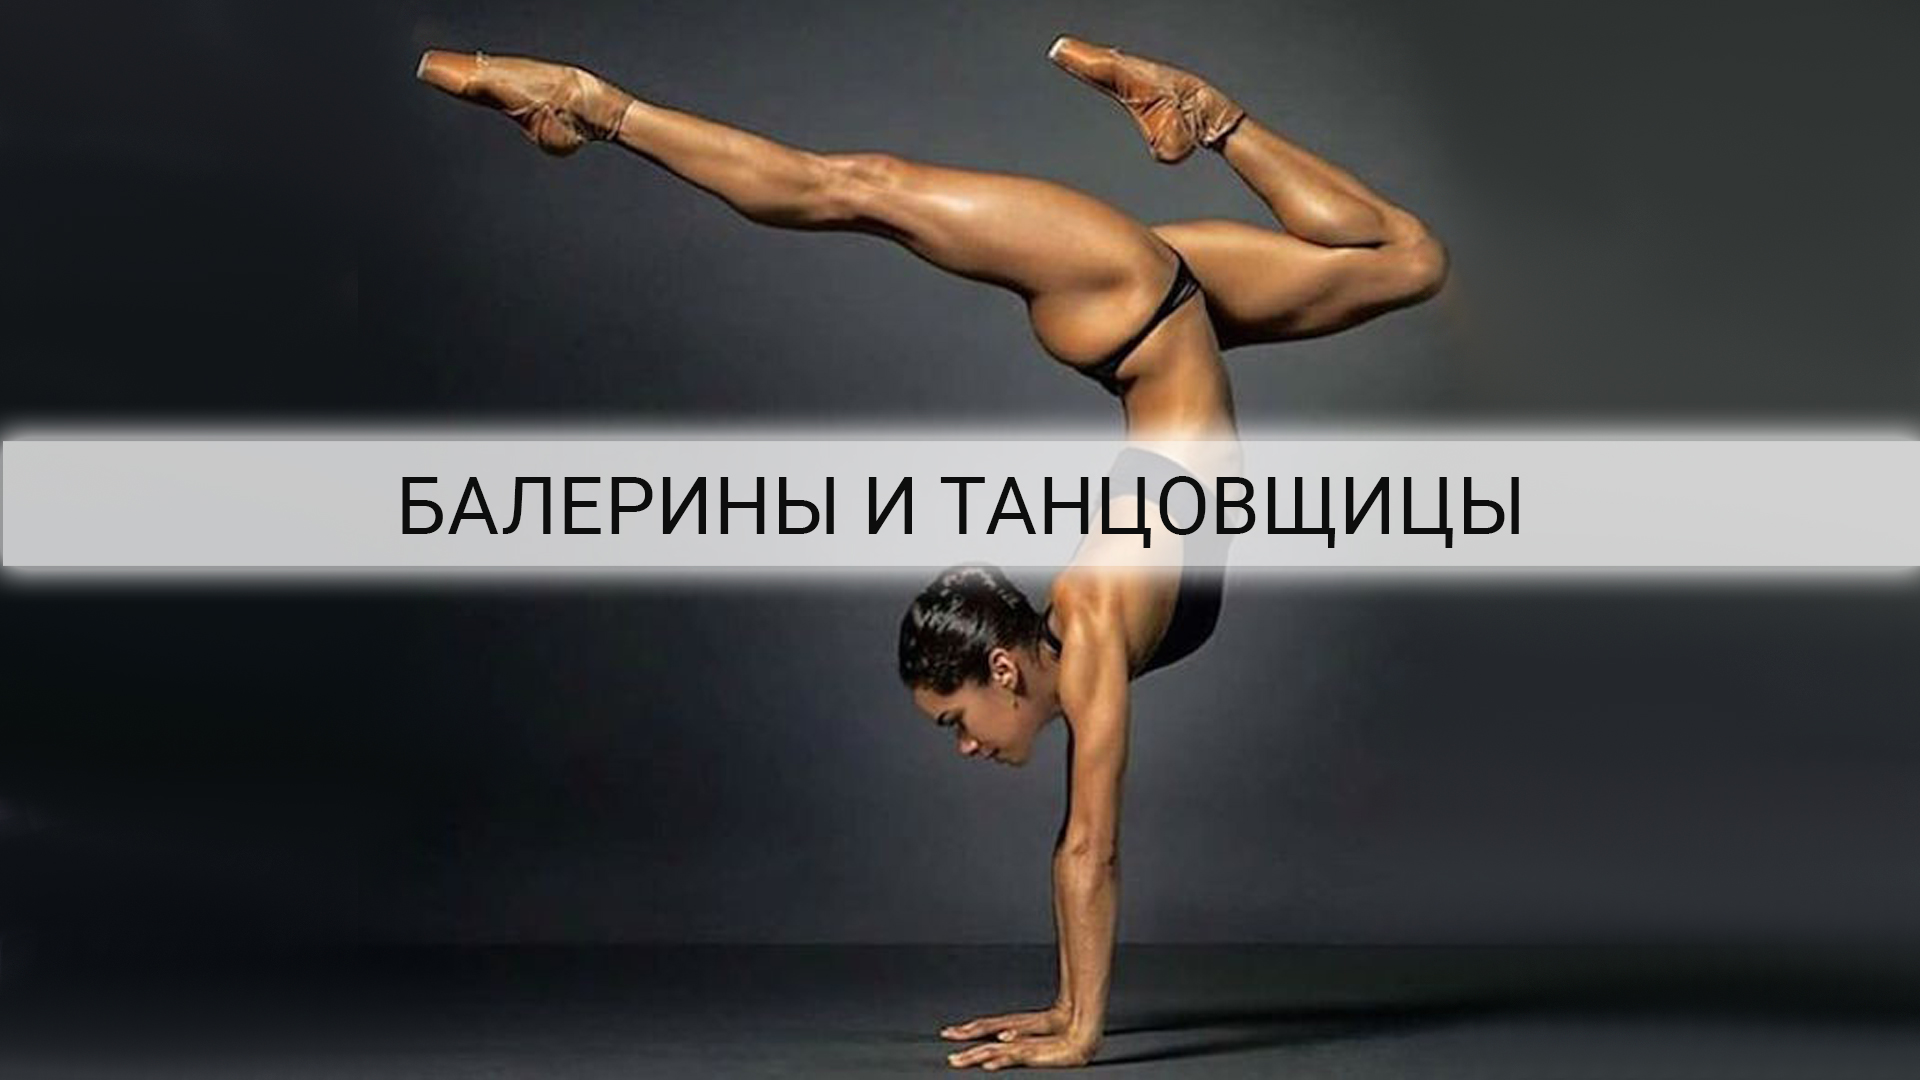 Балерины и танцовщицы